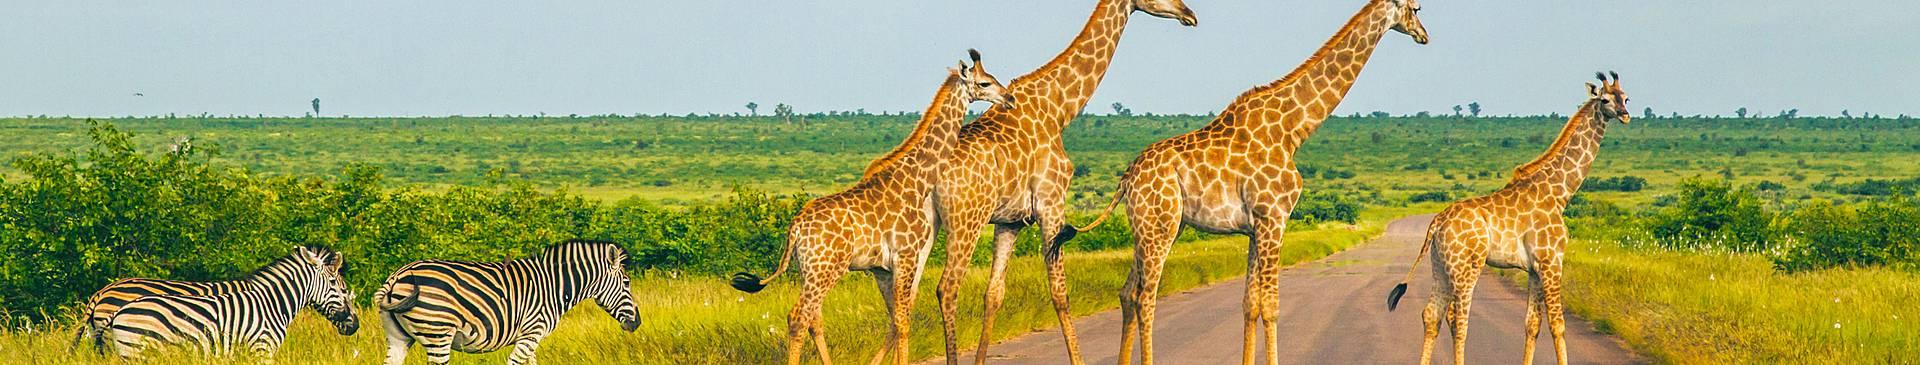 Circuits Safari au Mozambique